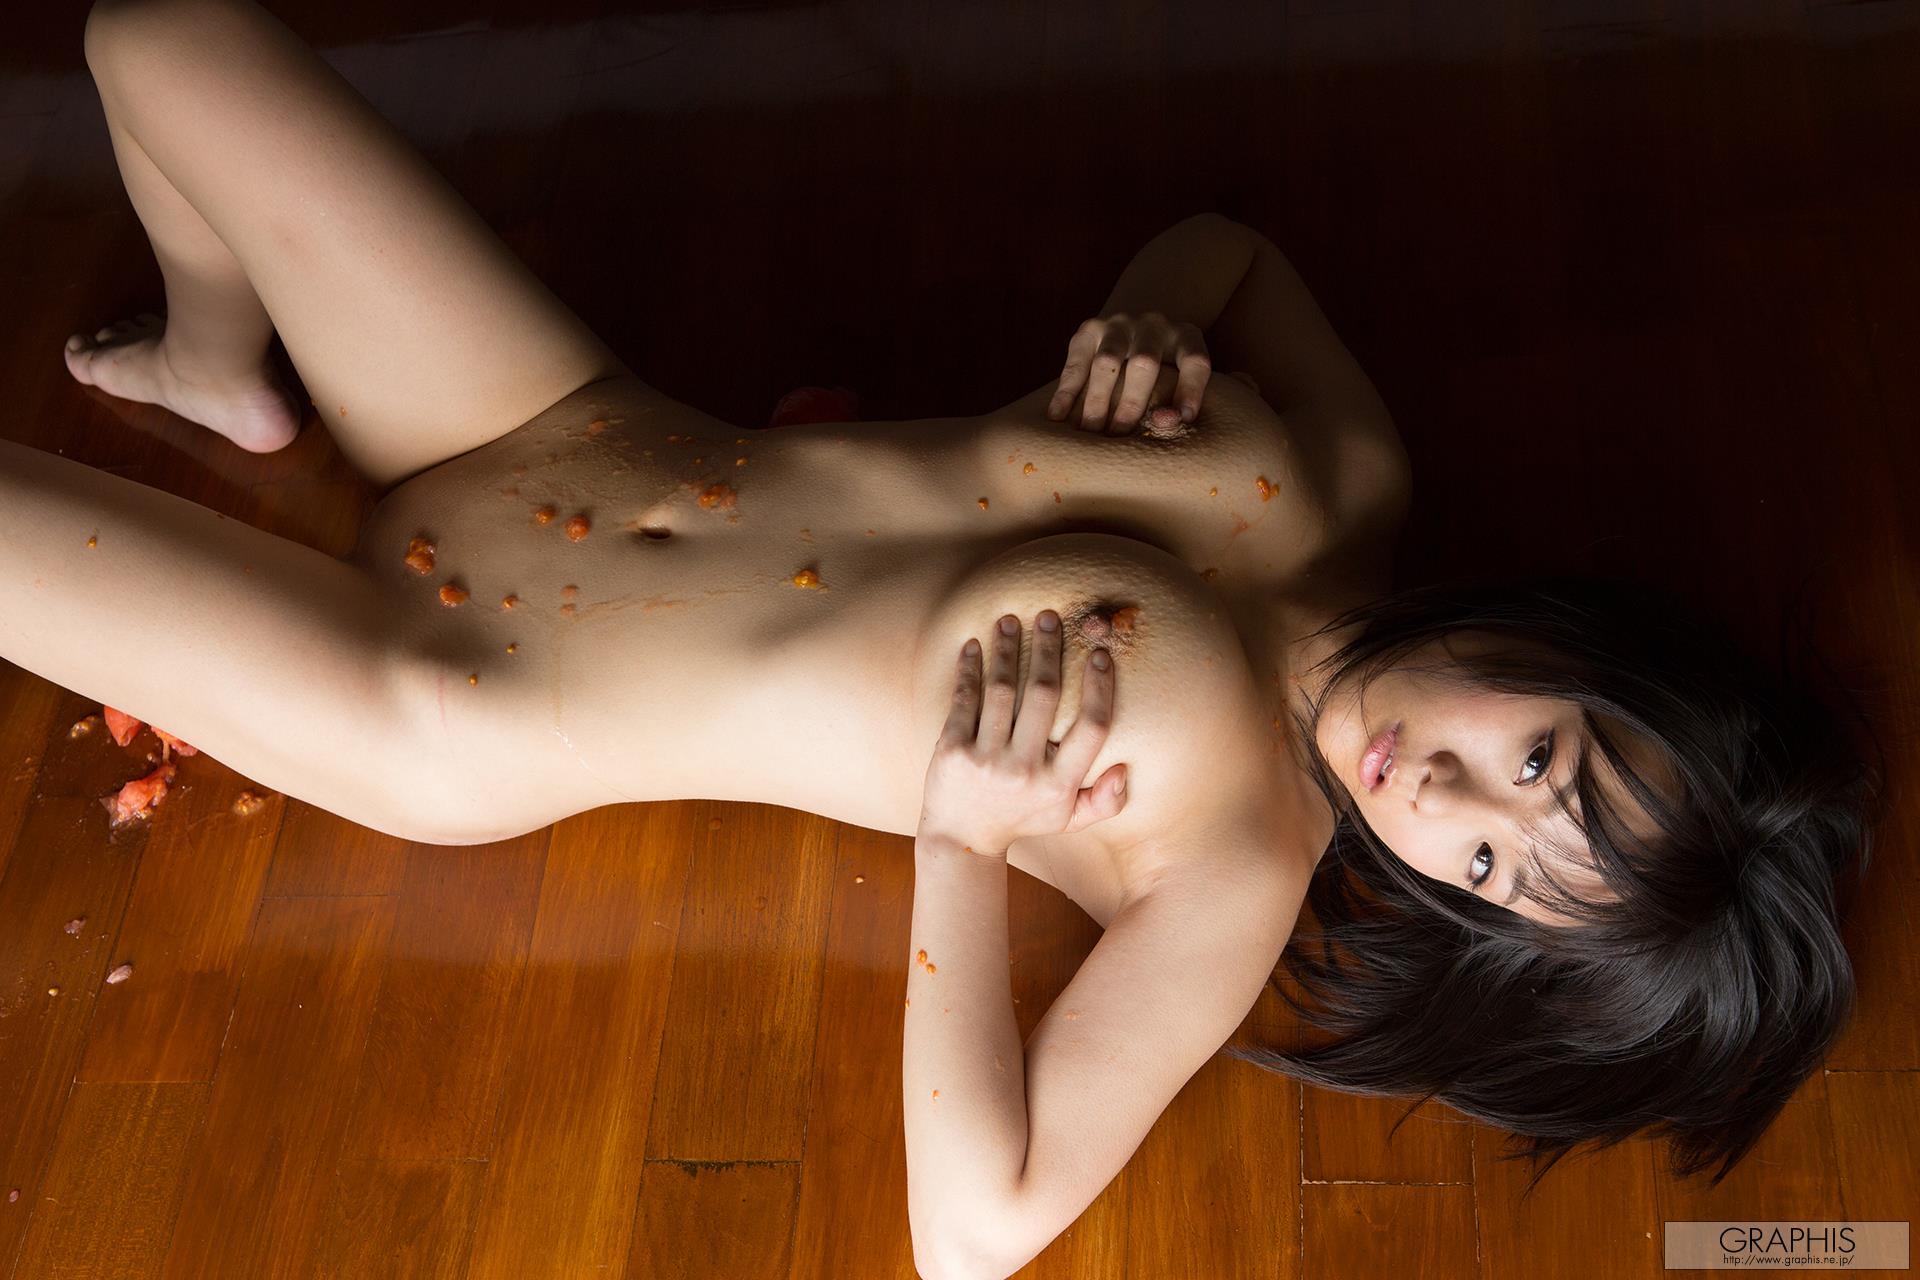 gra_kaho-s050.jpg